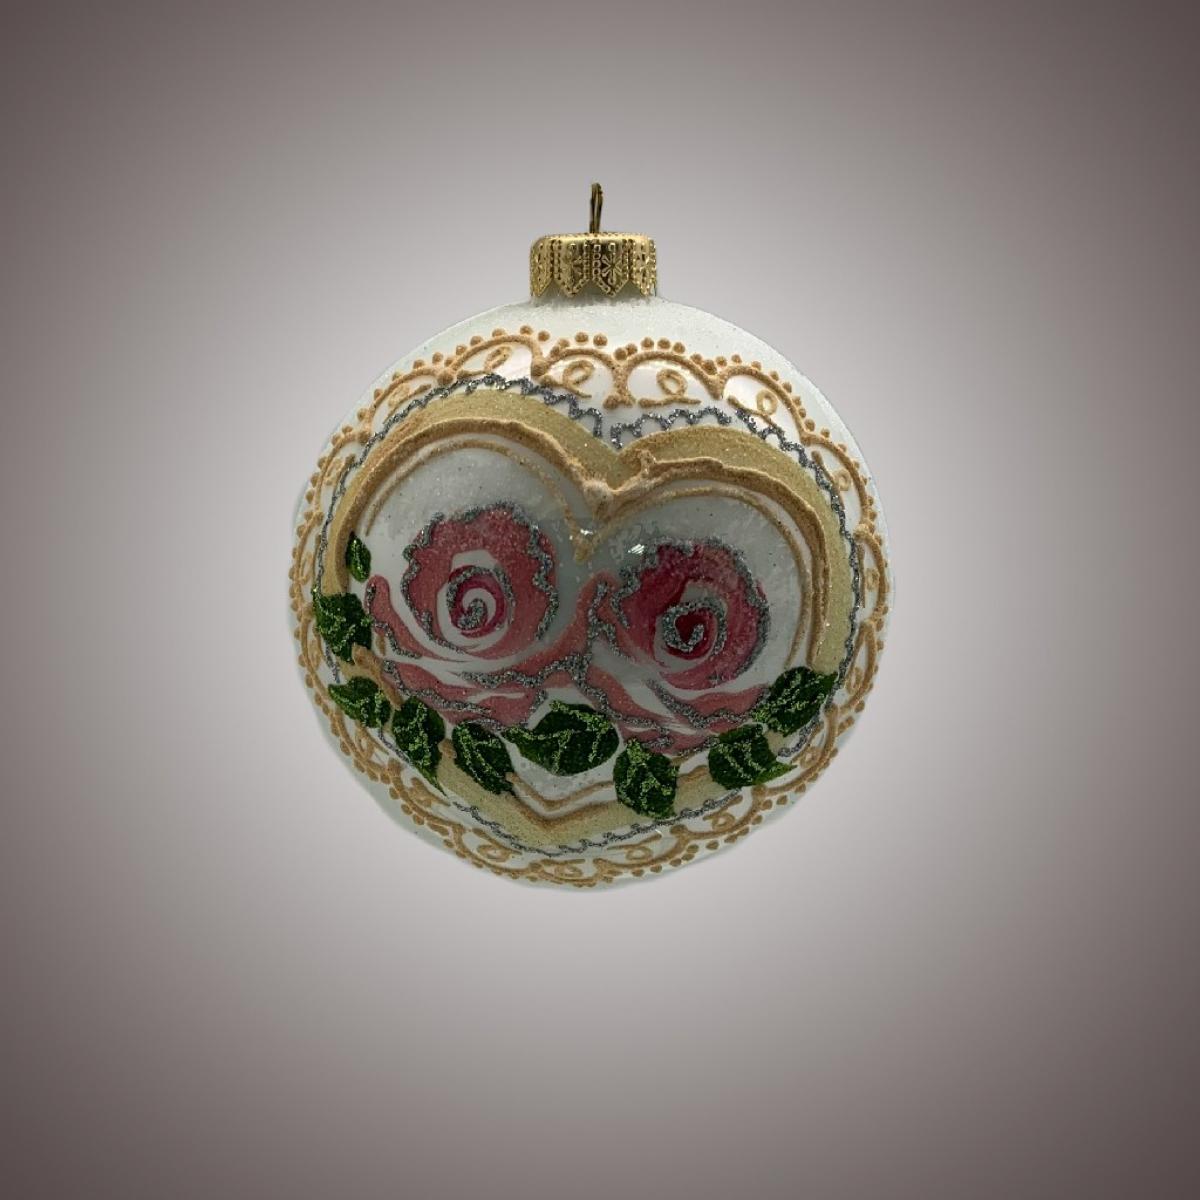 Шар Д 100 в инд.упак. Гламур роза коллекция белая АРТ 91549